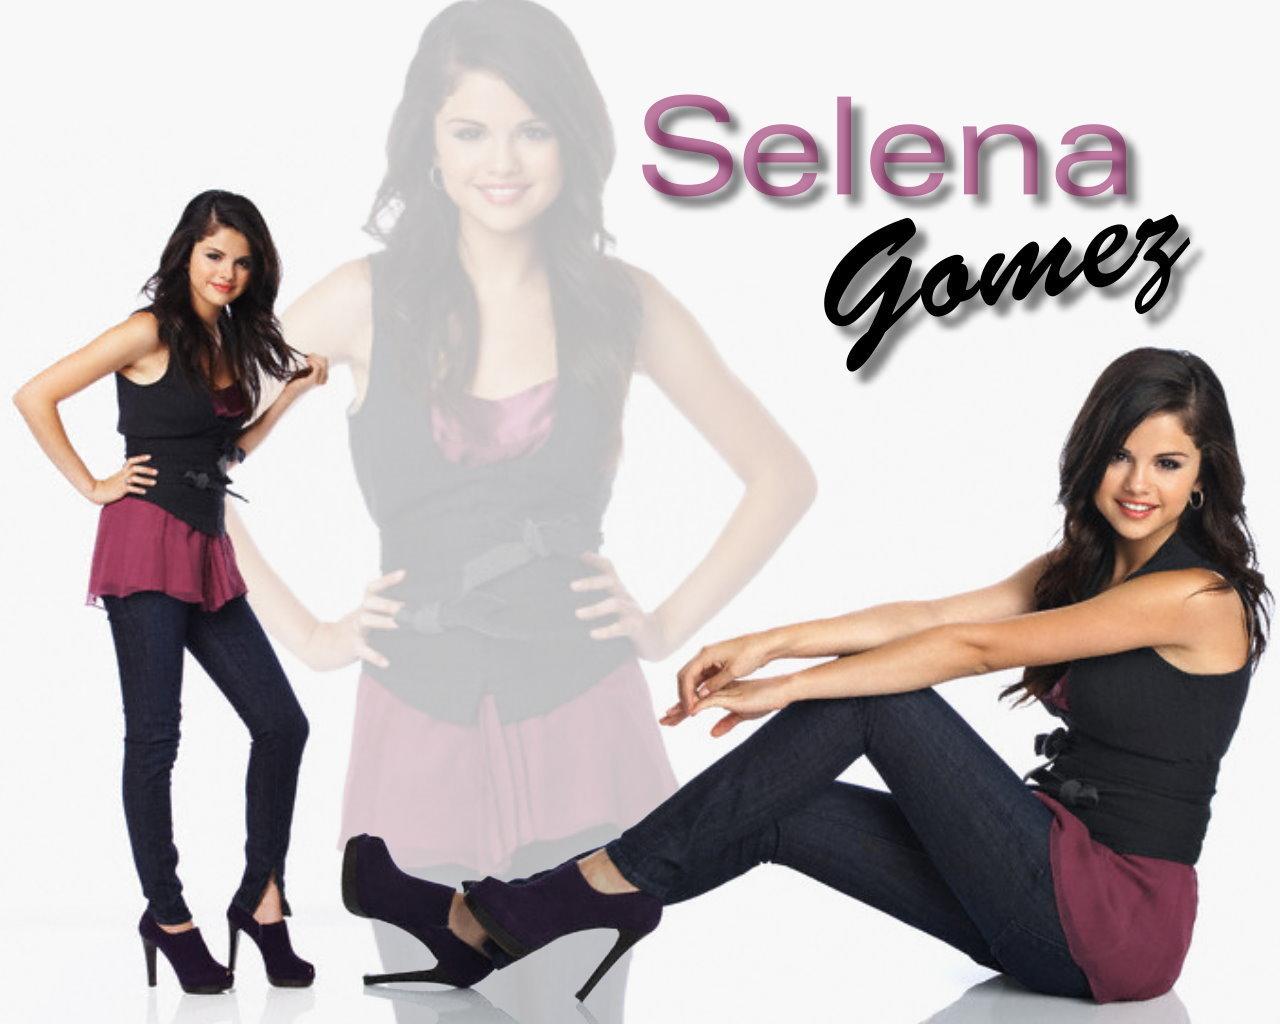 Selena Gomez - Posters/Wallpaper.